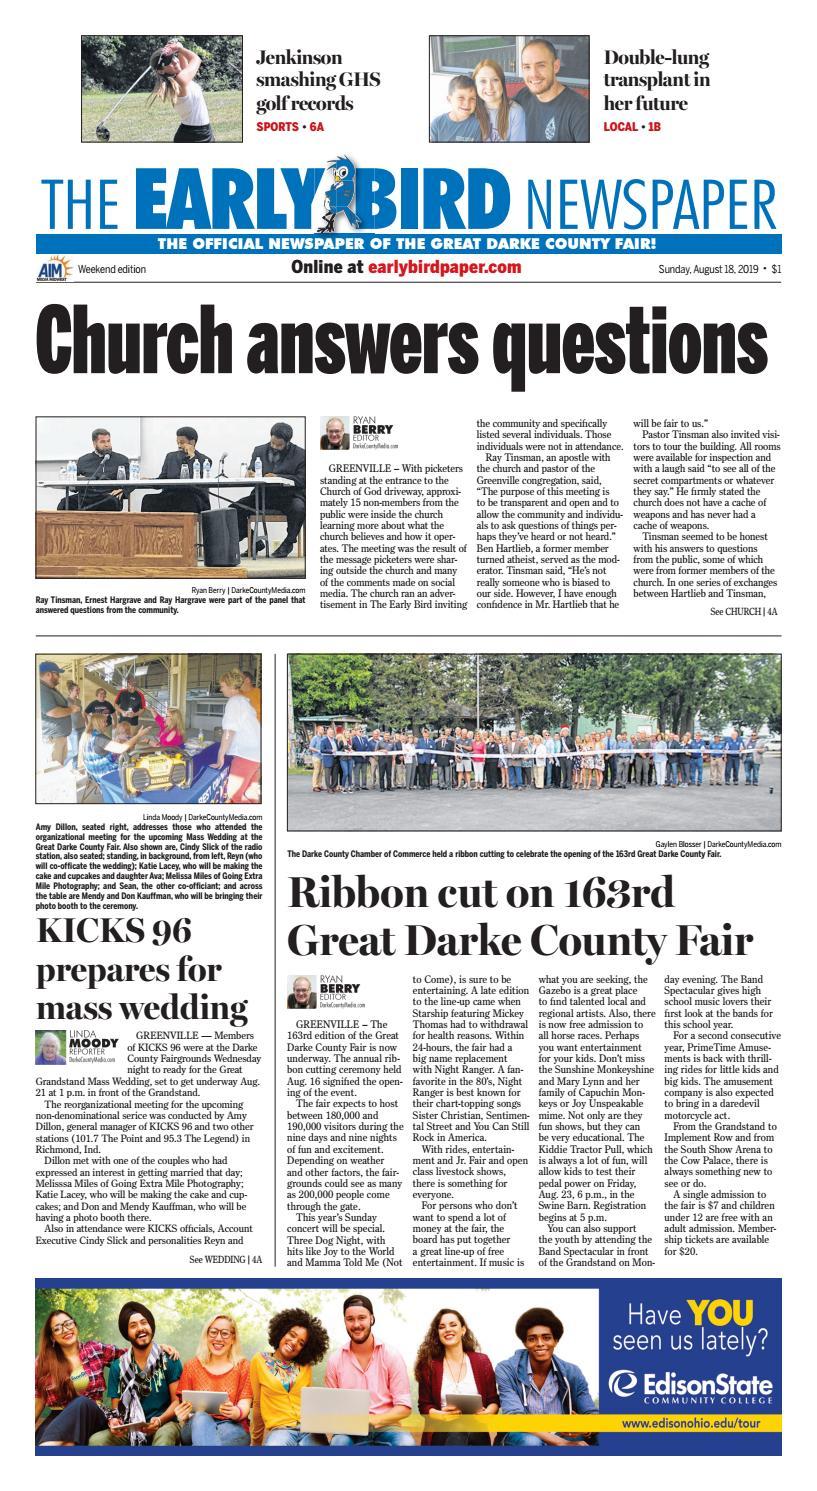 Darke County Arrest Records by City